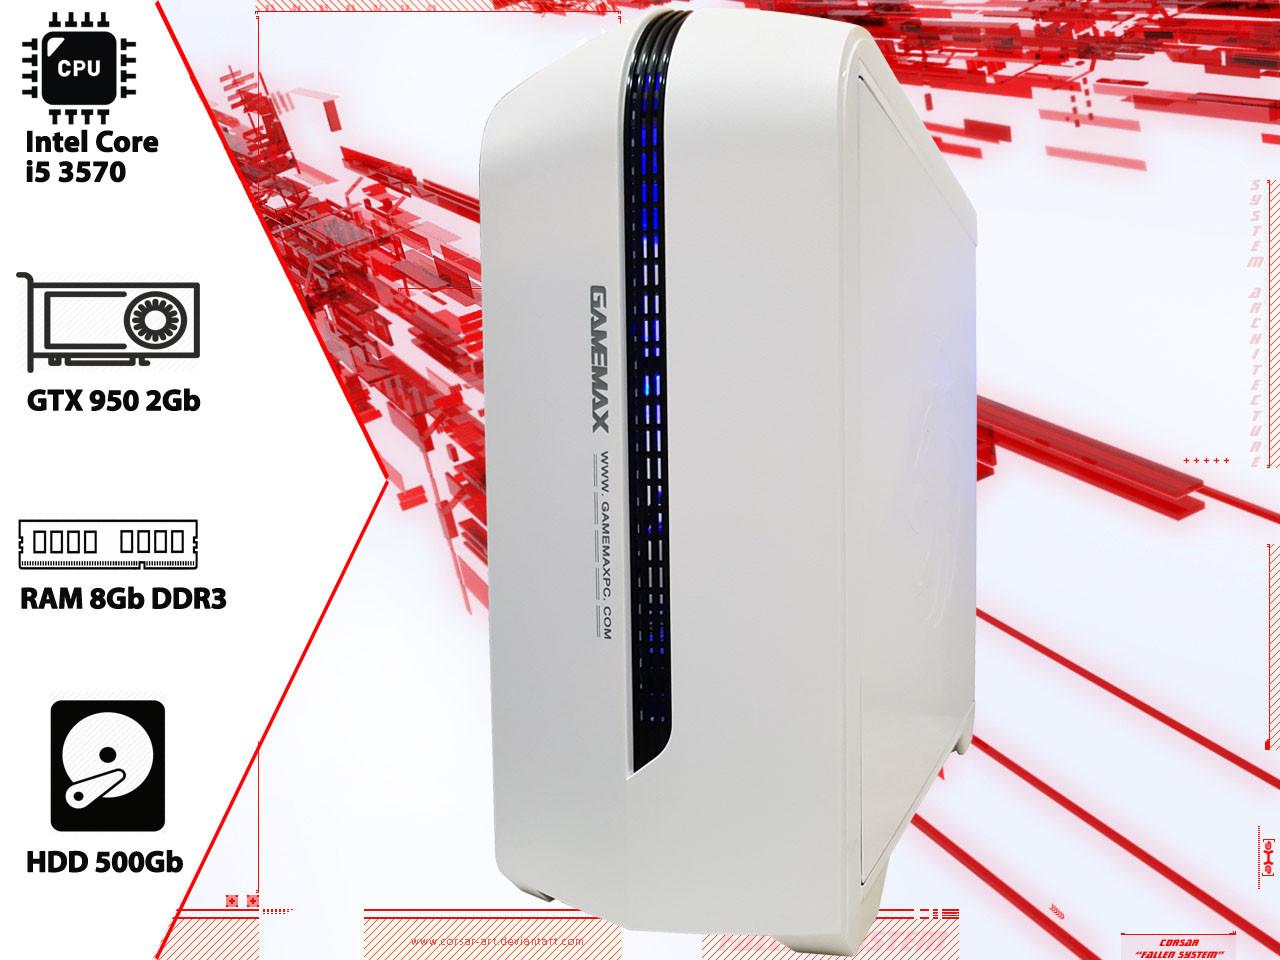 Игровой ПК Intel Core i5 3570, GTX 950, DDR3 8Gb, 500Gb